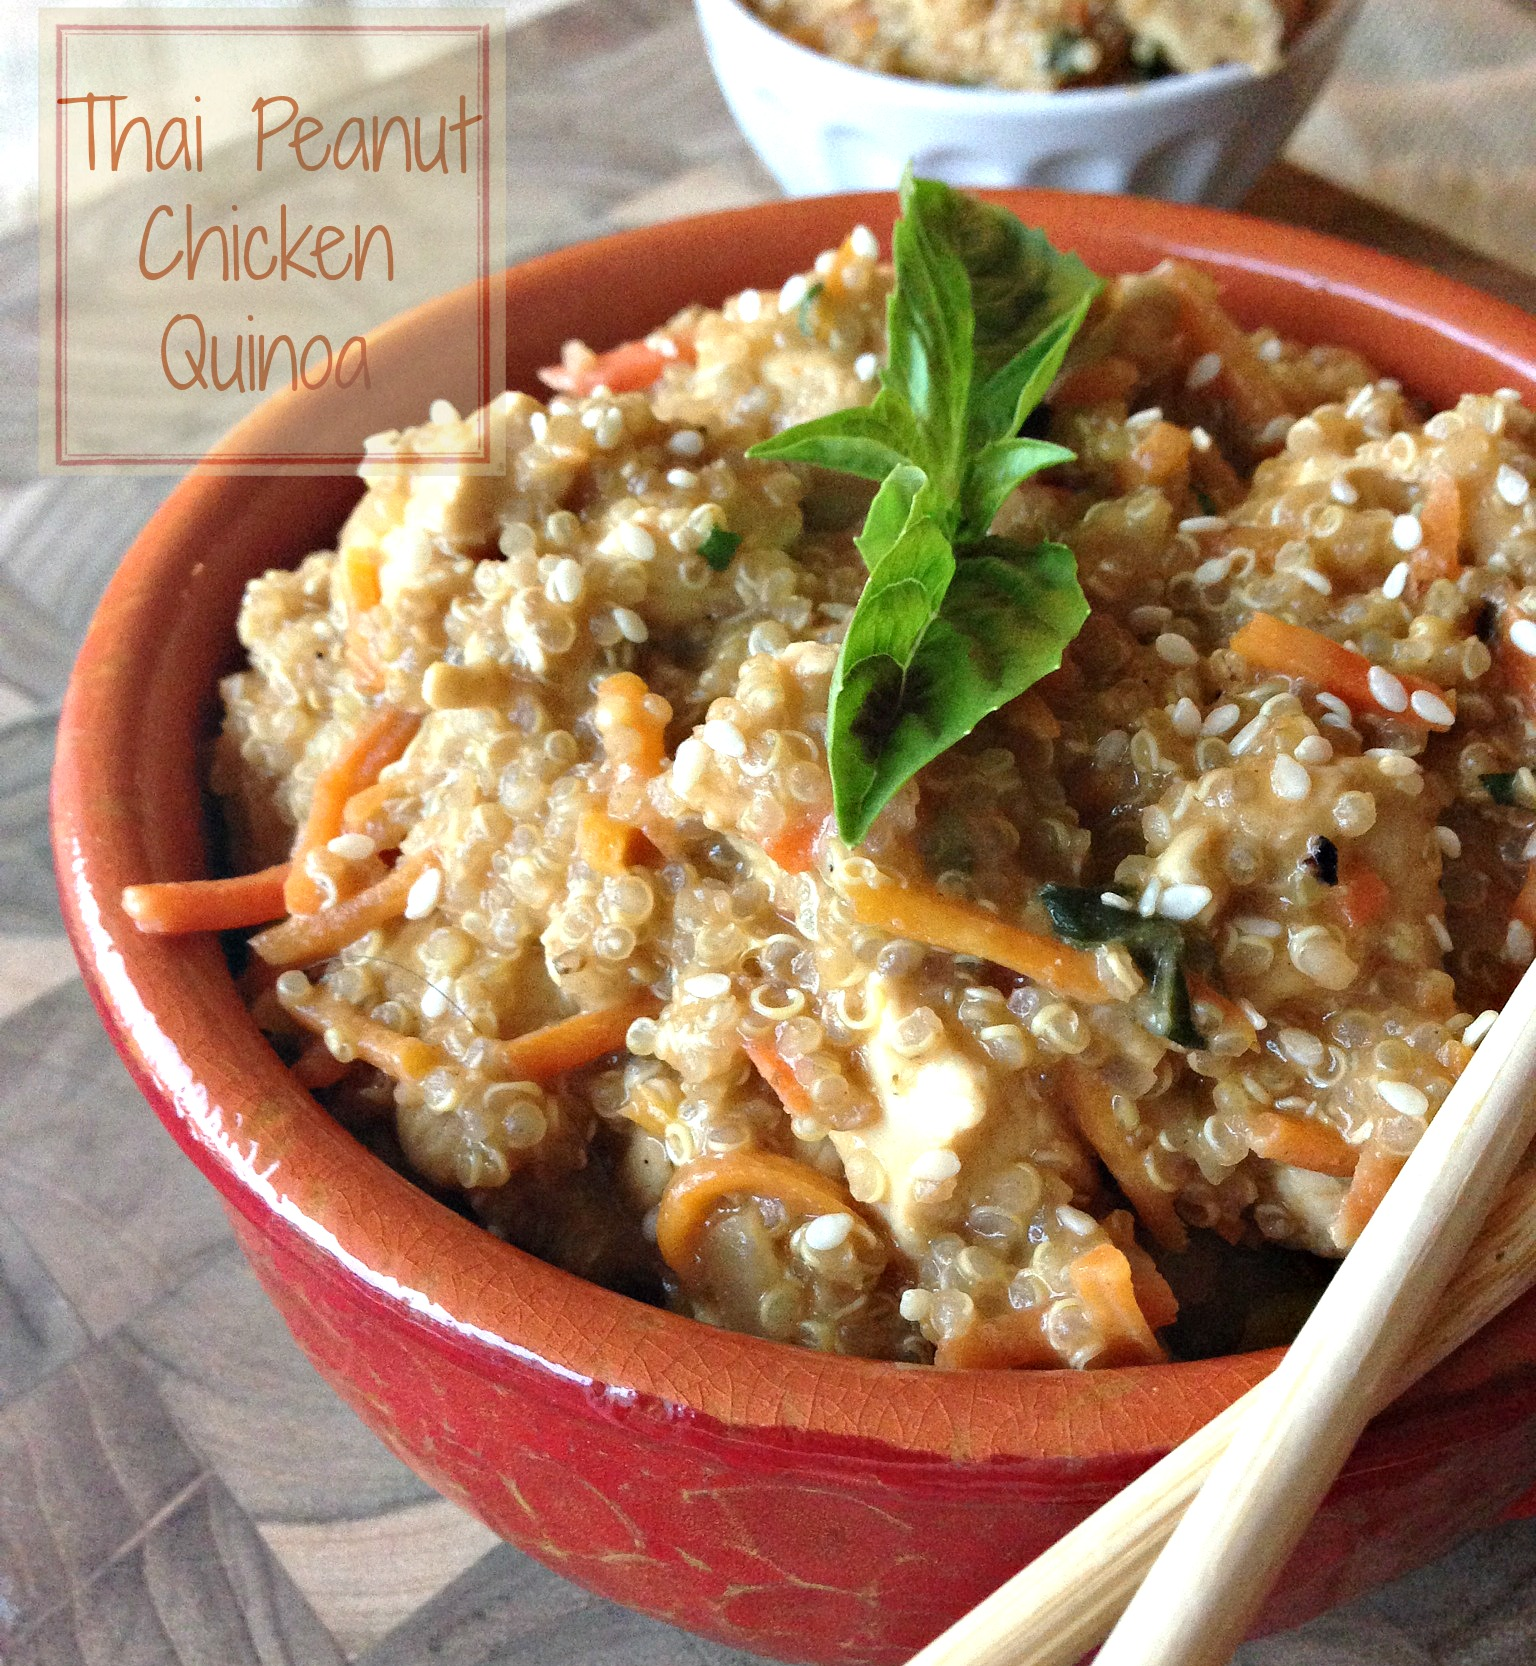 Thai Peanut Chicken with Quinoa